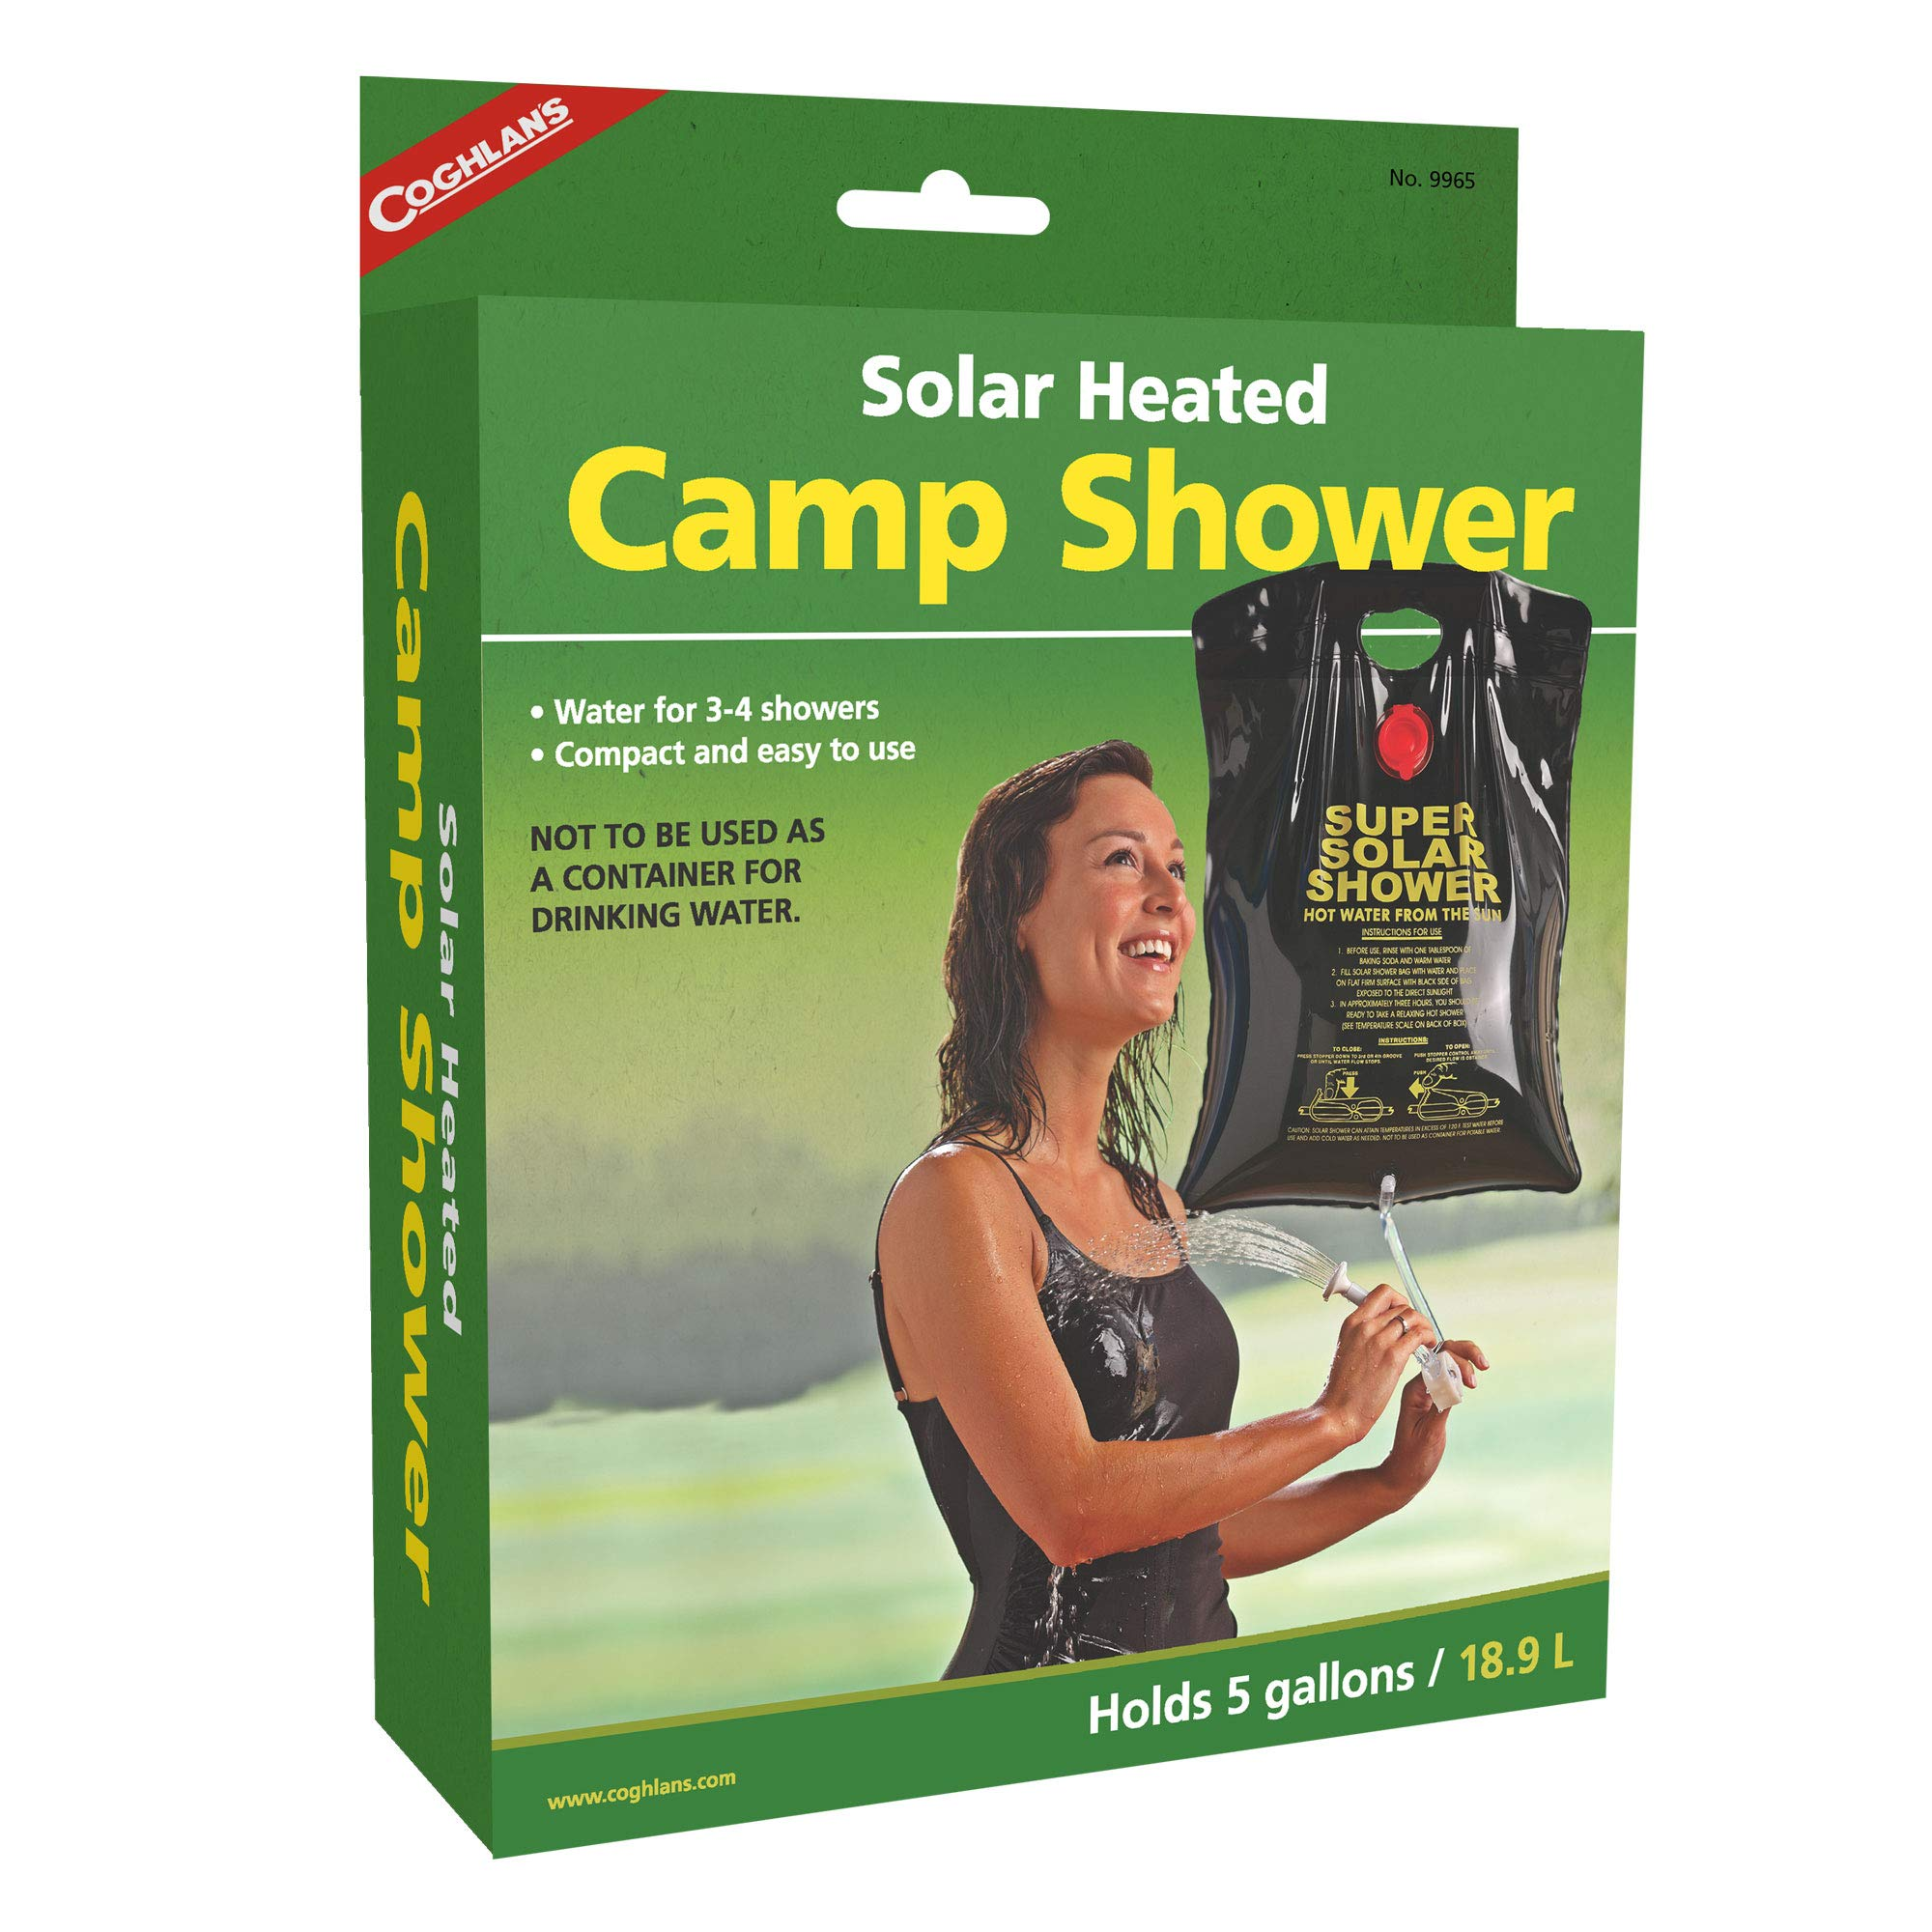 Coghlan's Solar Heated Camp Shower, 5-Gallon, Black